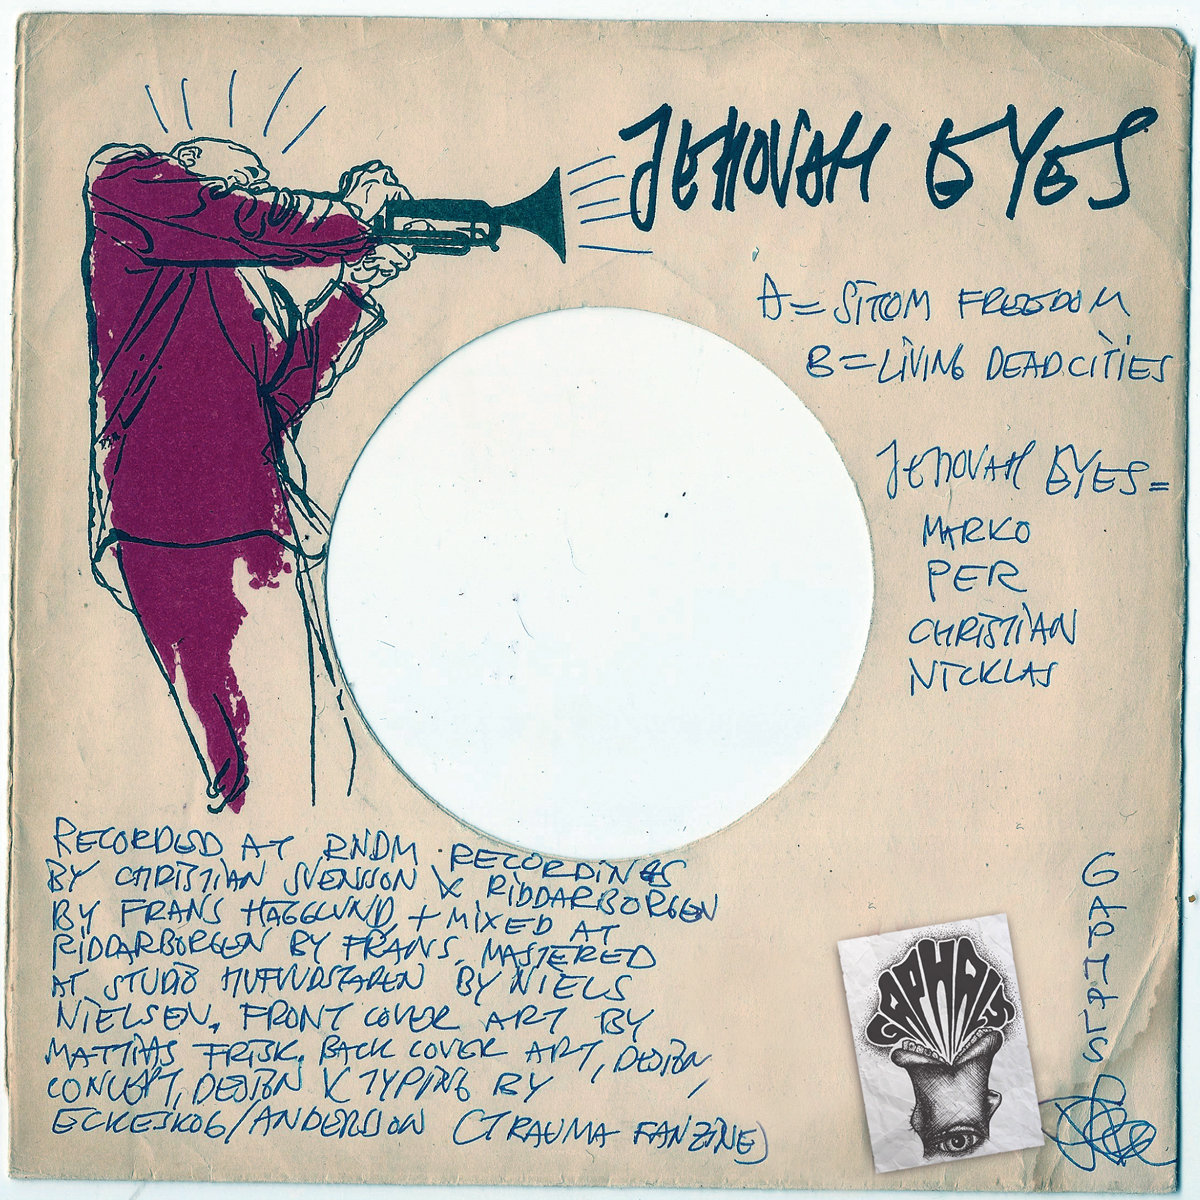 Jehovah Eyes - Sitcom Freedom | Gaphals